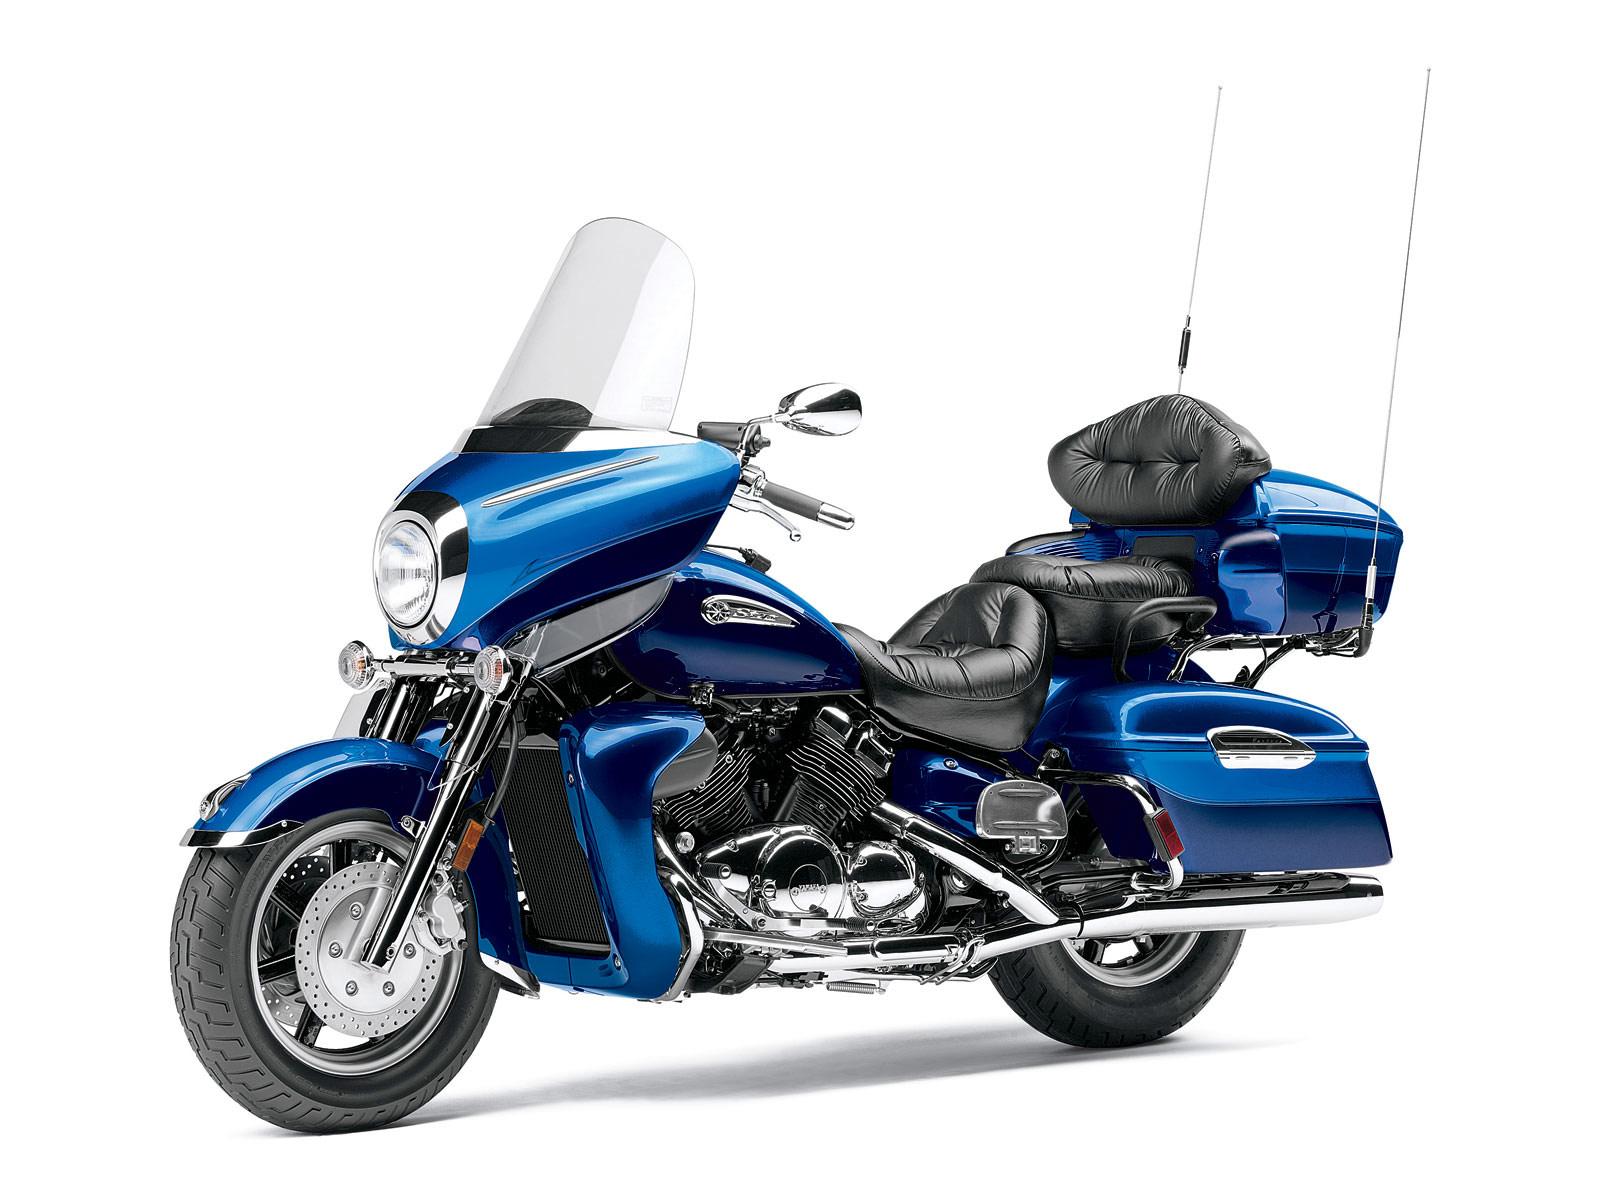 Yamaha accident lawyers royal star venture s 2011 wallpapers for Yamaha royal star motorcycle